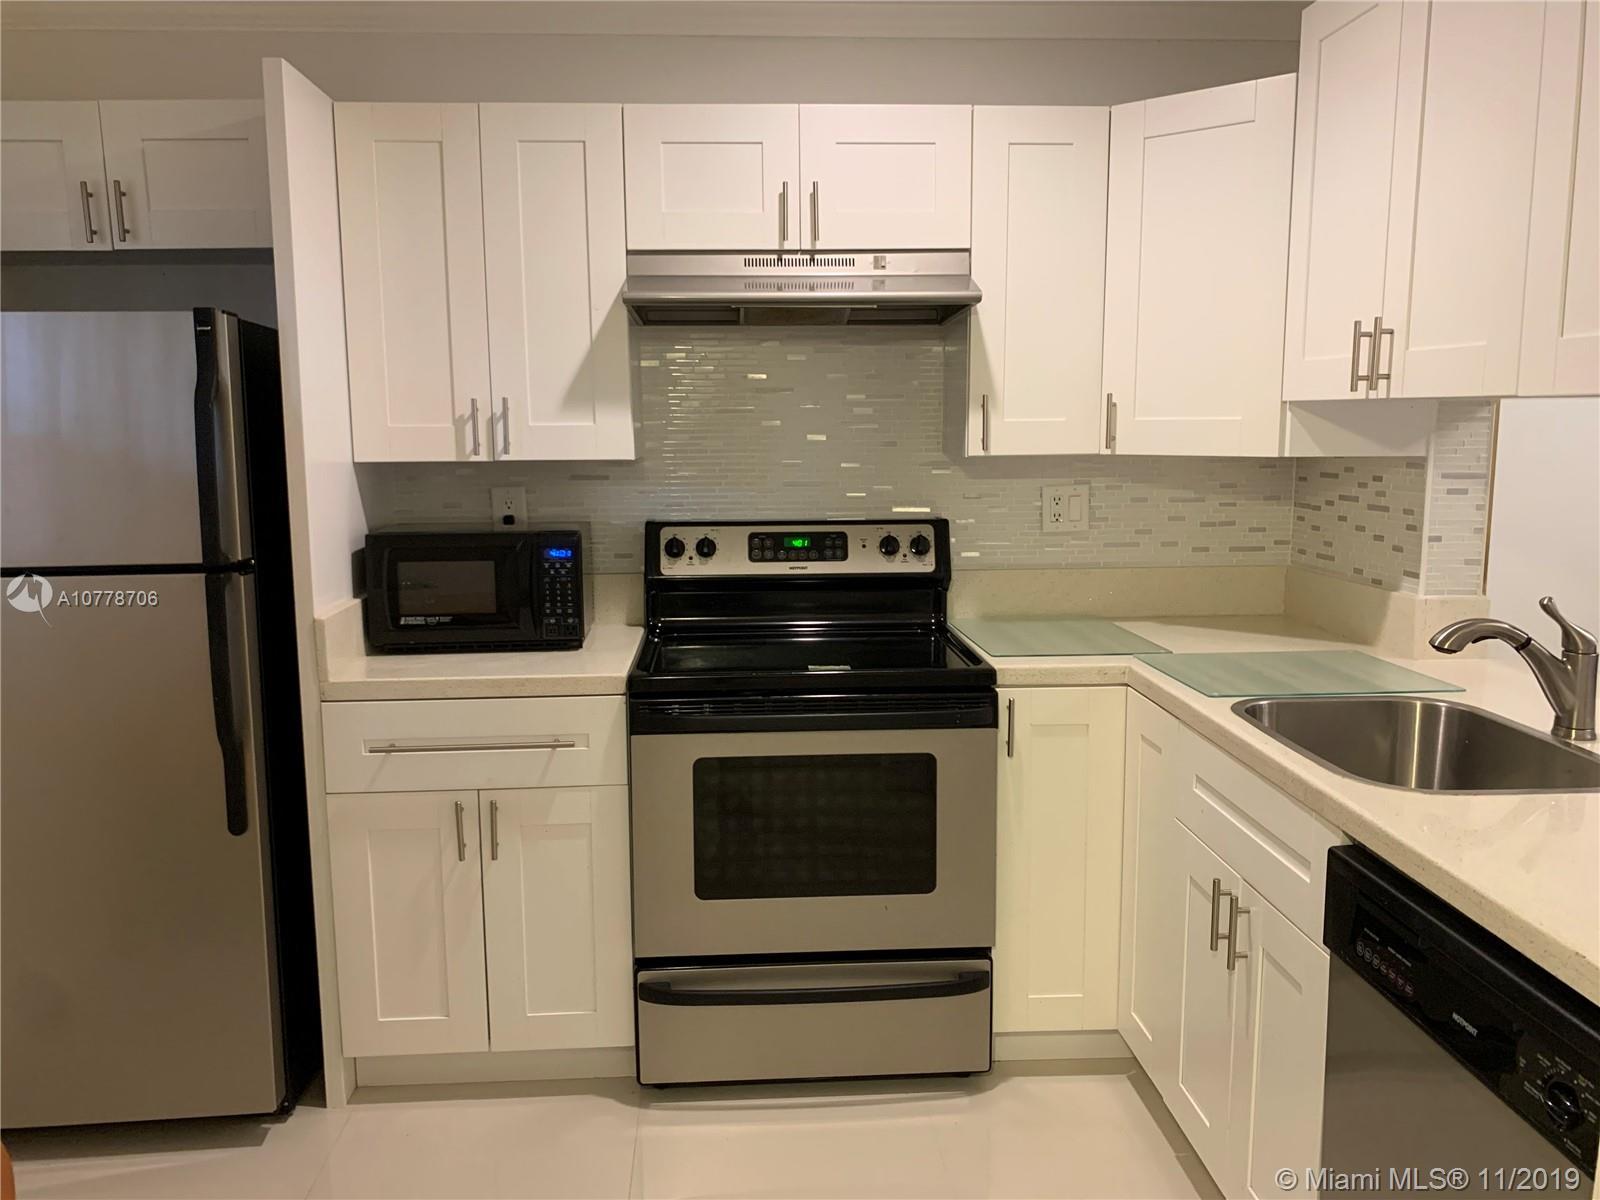 8818 W Mcnab Rd # 303, Tamarac, Florida 33321, 1 Bedroom Bedrooms, ,2 BathroomsBathrooms,Residential,For Sale,8818 W Mcnab Rd # 303,A10778706